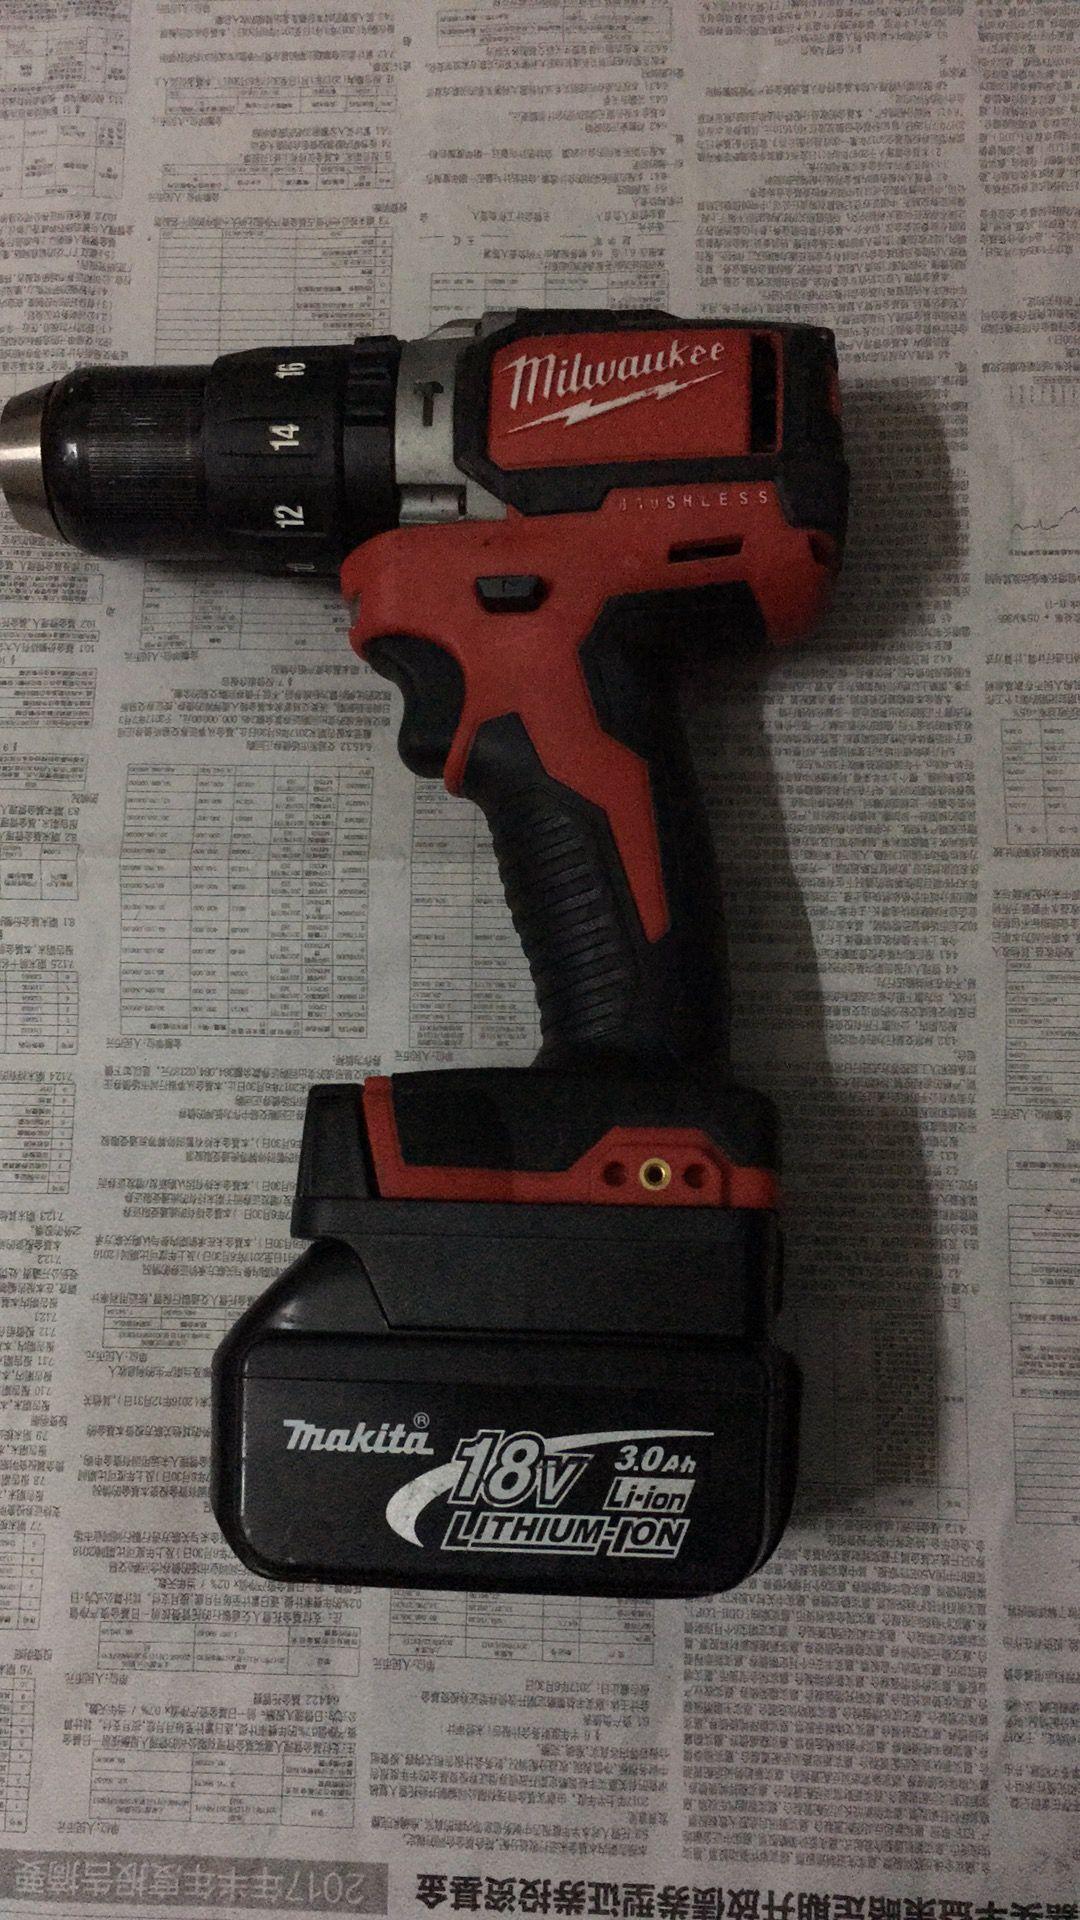 Makita 18V Power Tools Li-ion Battery Adapter convert to Milwaukee 18V tool  usage